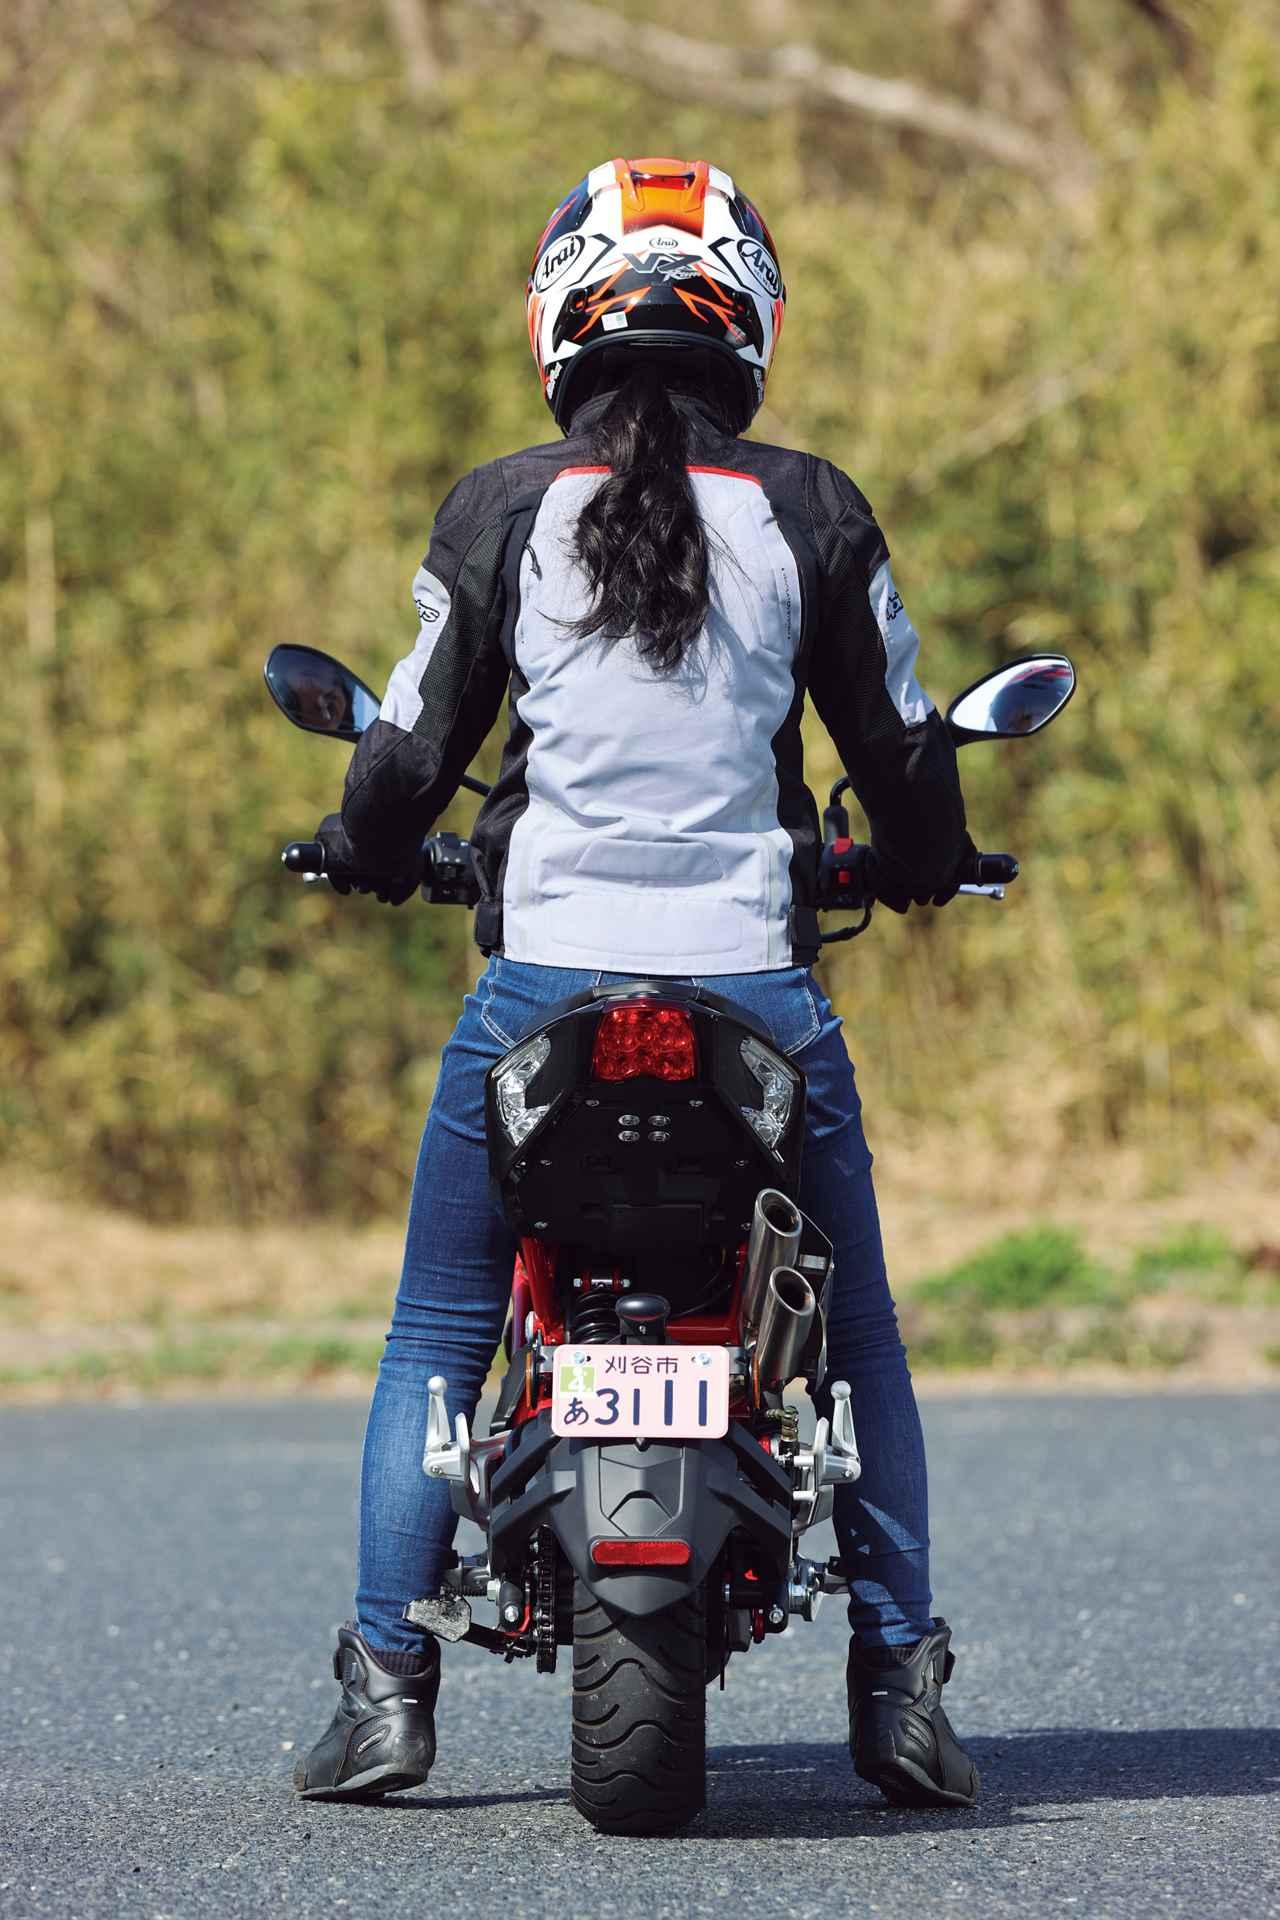 Images : 6番目の画像 - 【写真13枚】ベネリ「TNT125」 - webオートバイ